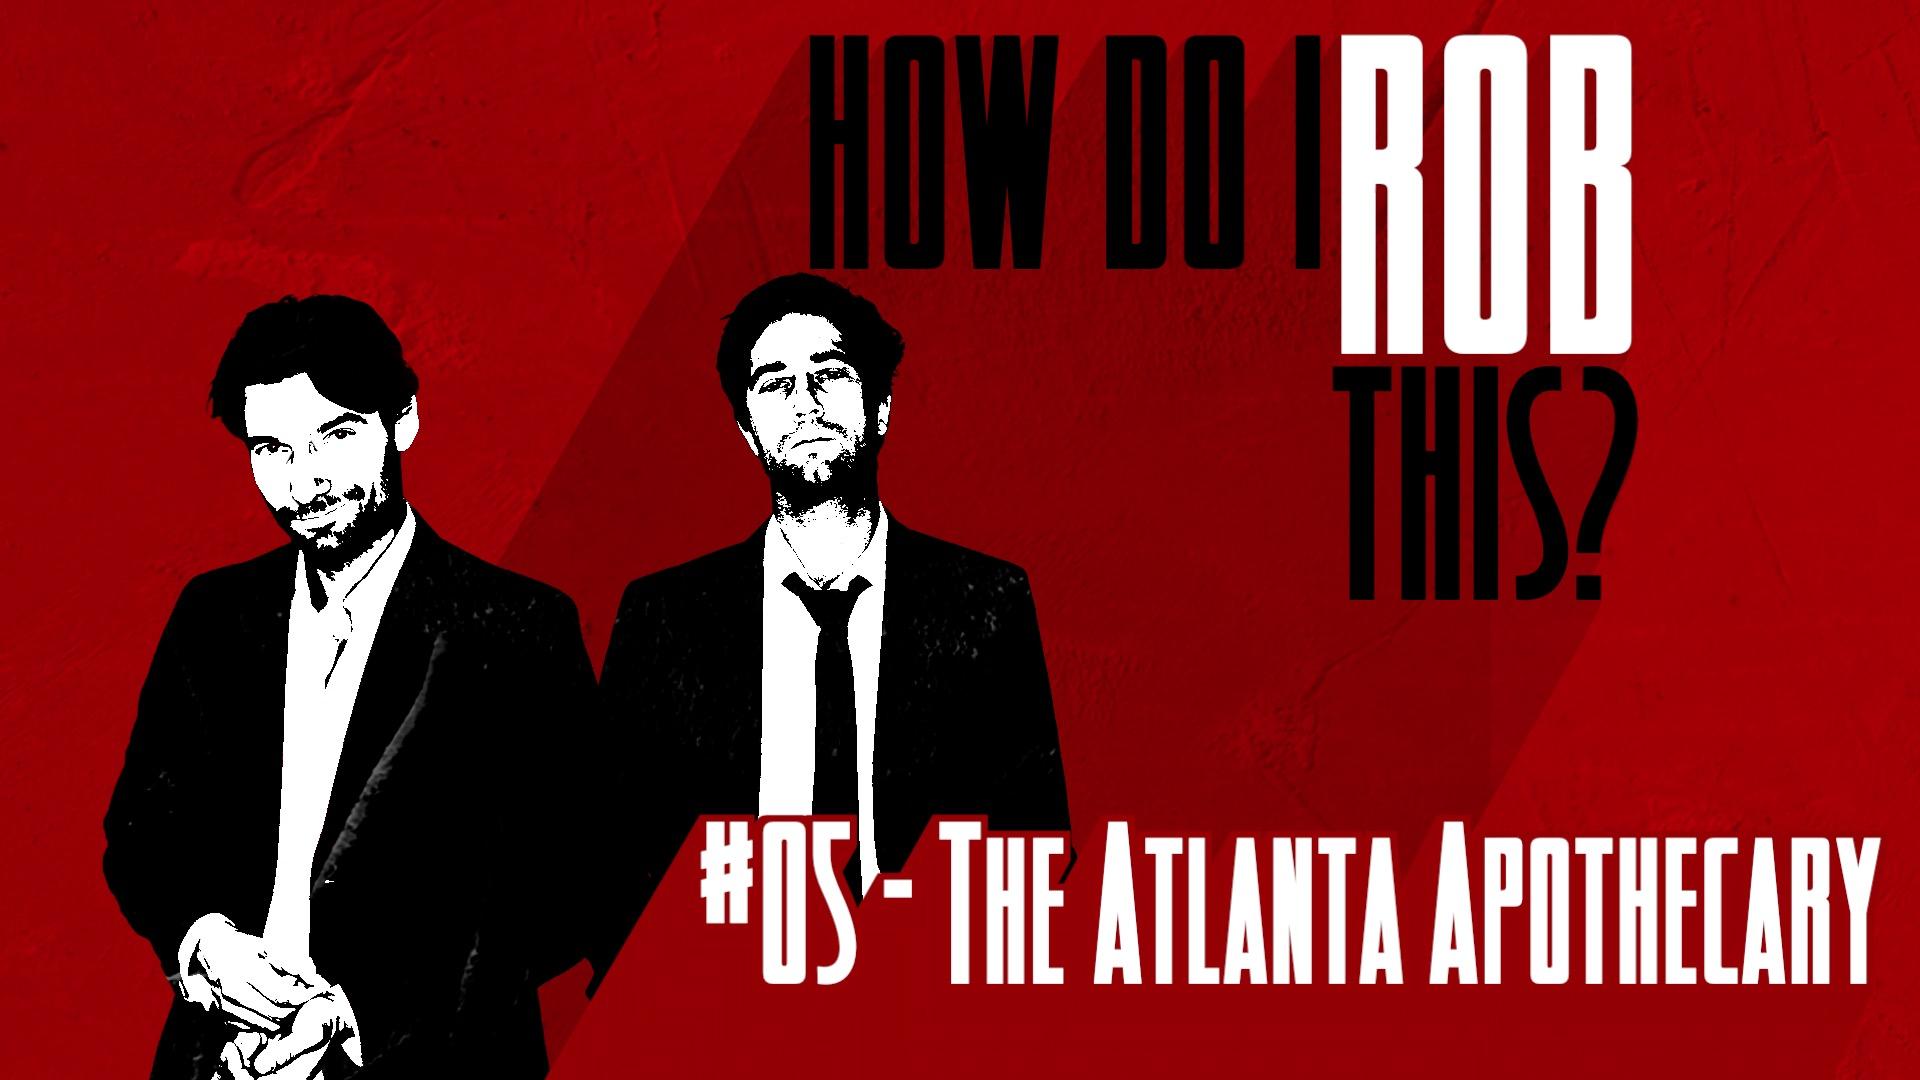 __How Do I Rob This_TITLE_05 Atlanta Apothecary